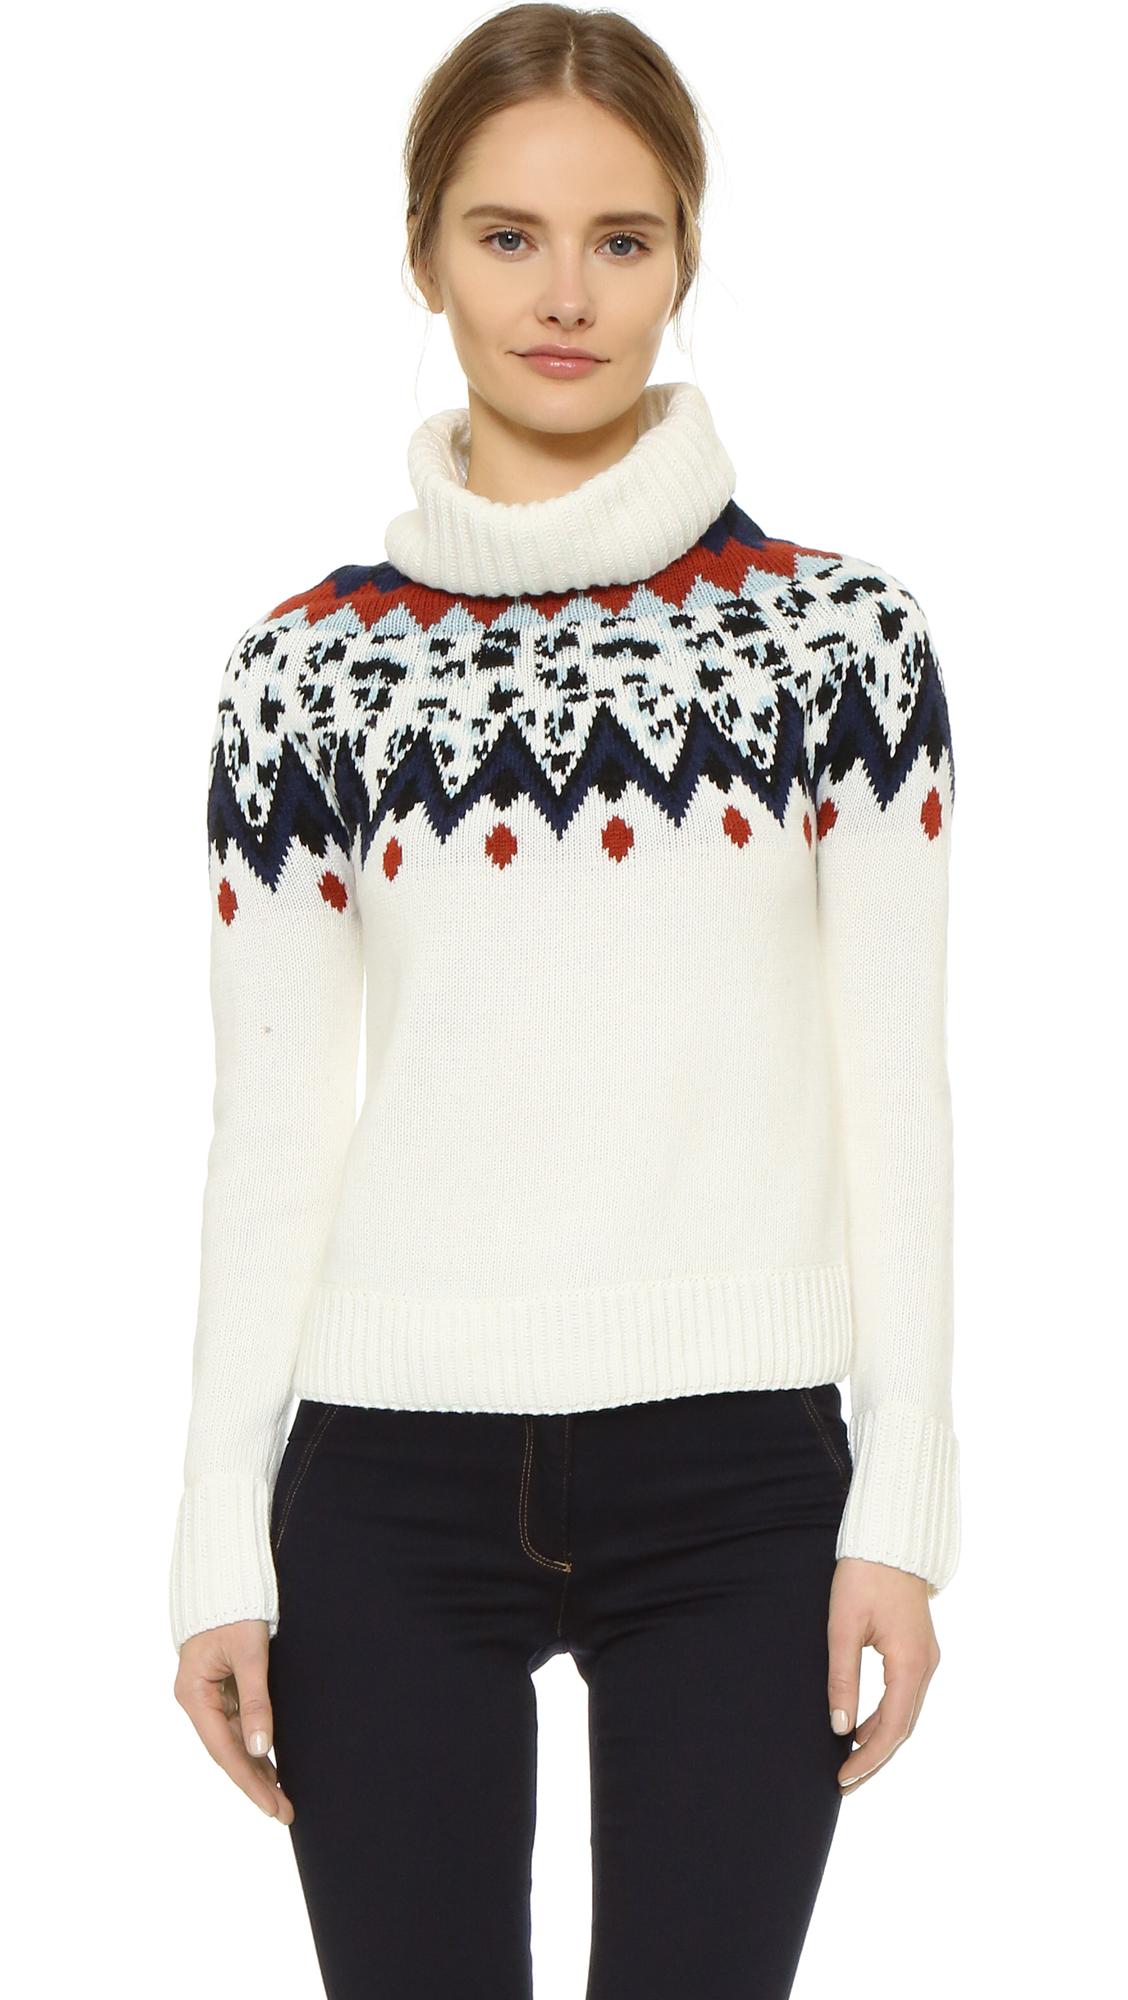 Veronica Beard Sun Valley Fair Isle Turtleneck Sweater - Ivory